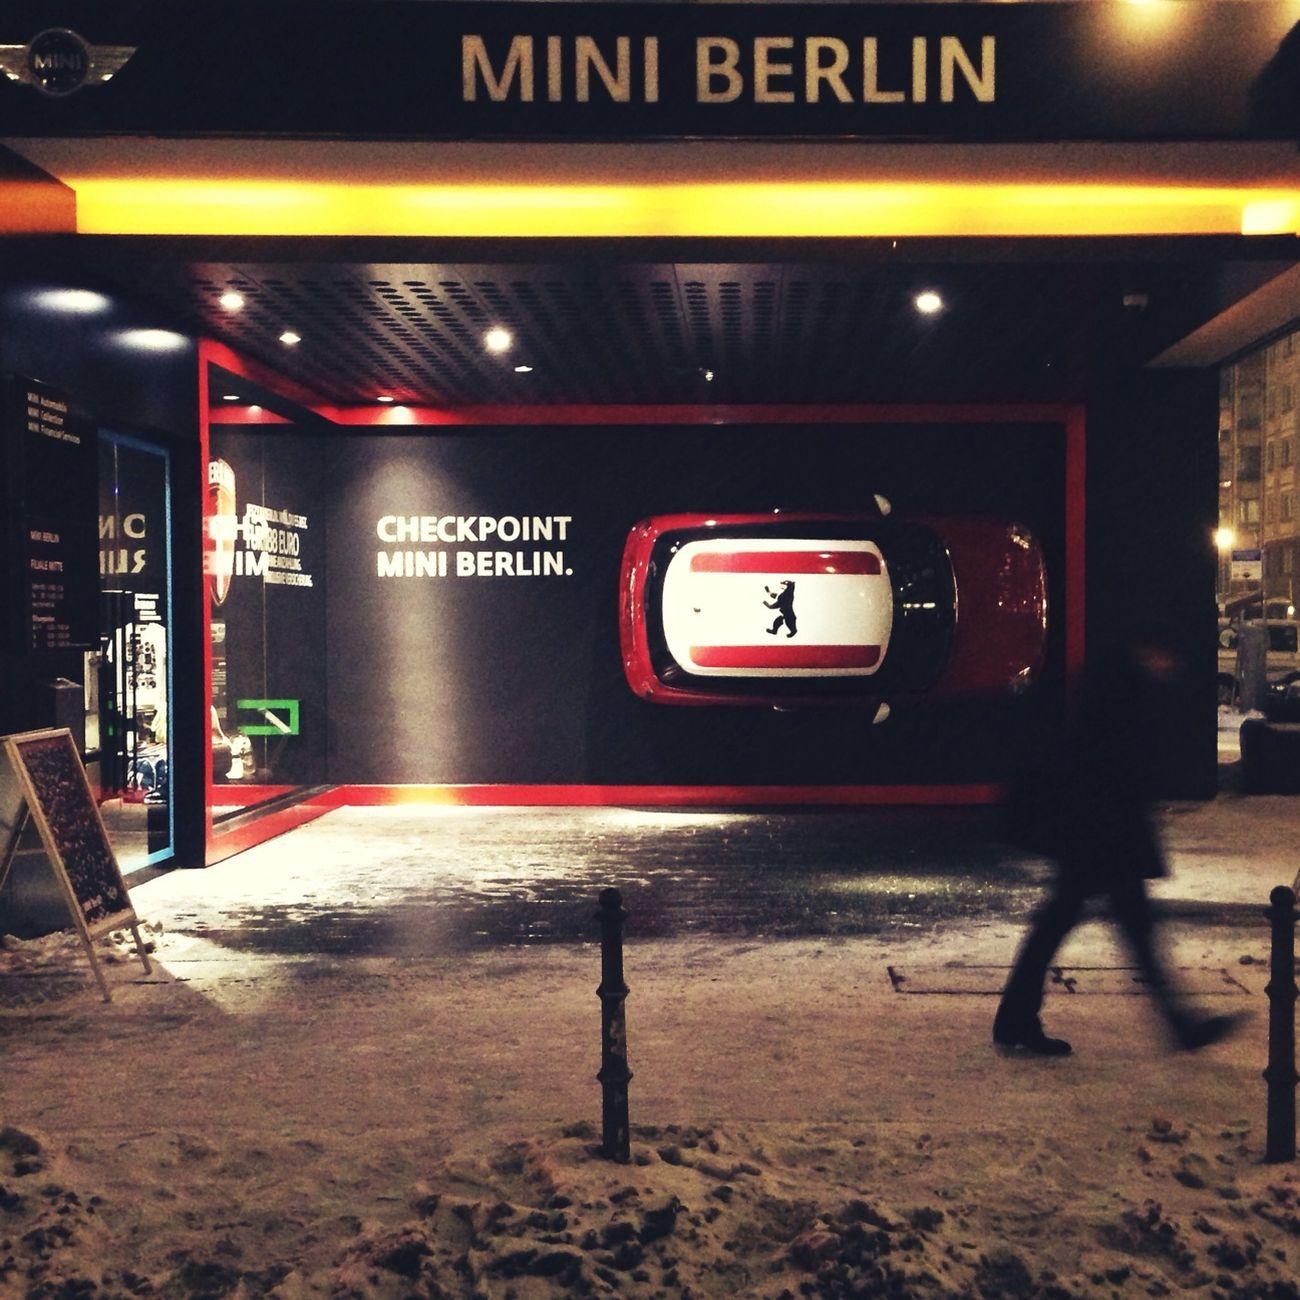 MINI BERLIN